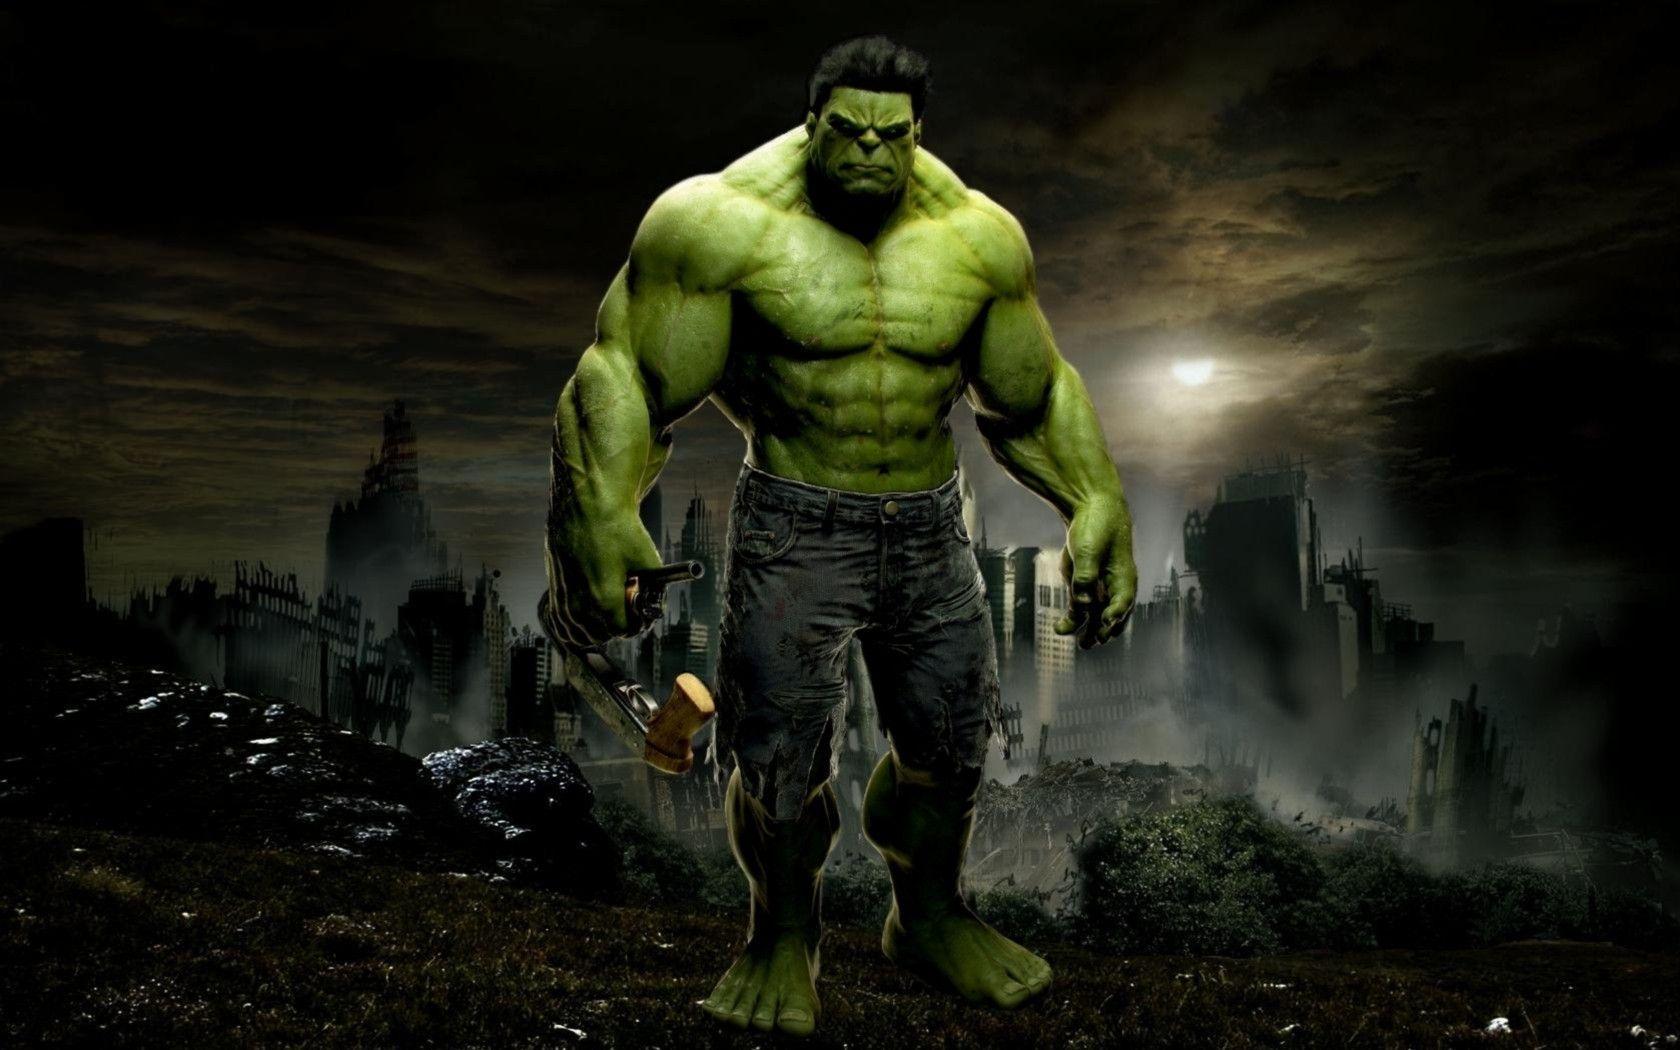 HD Hulk Wallpaper   52DazheW Gallery 1680x1050